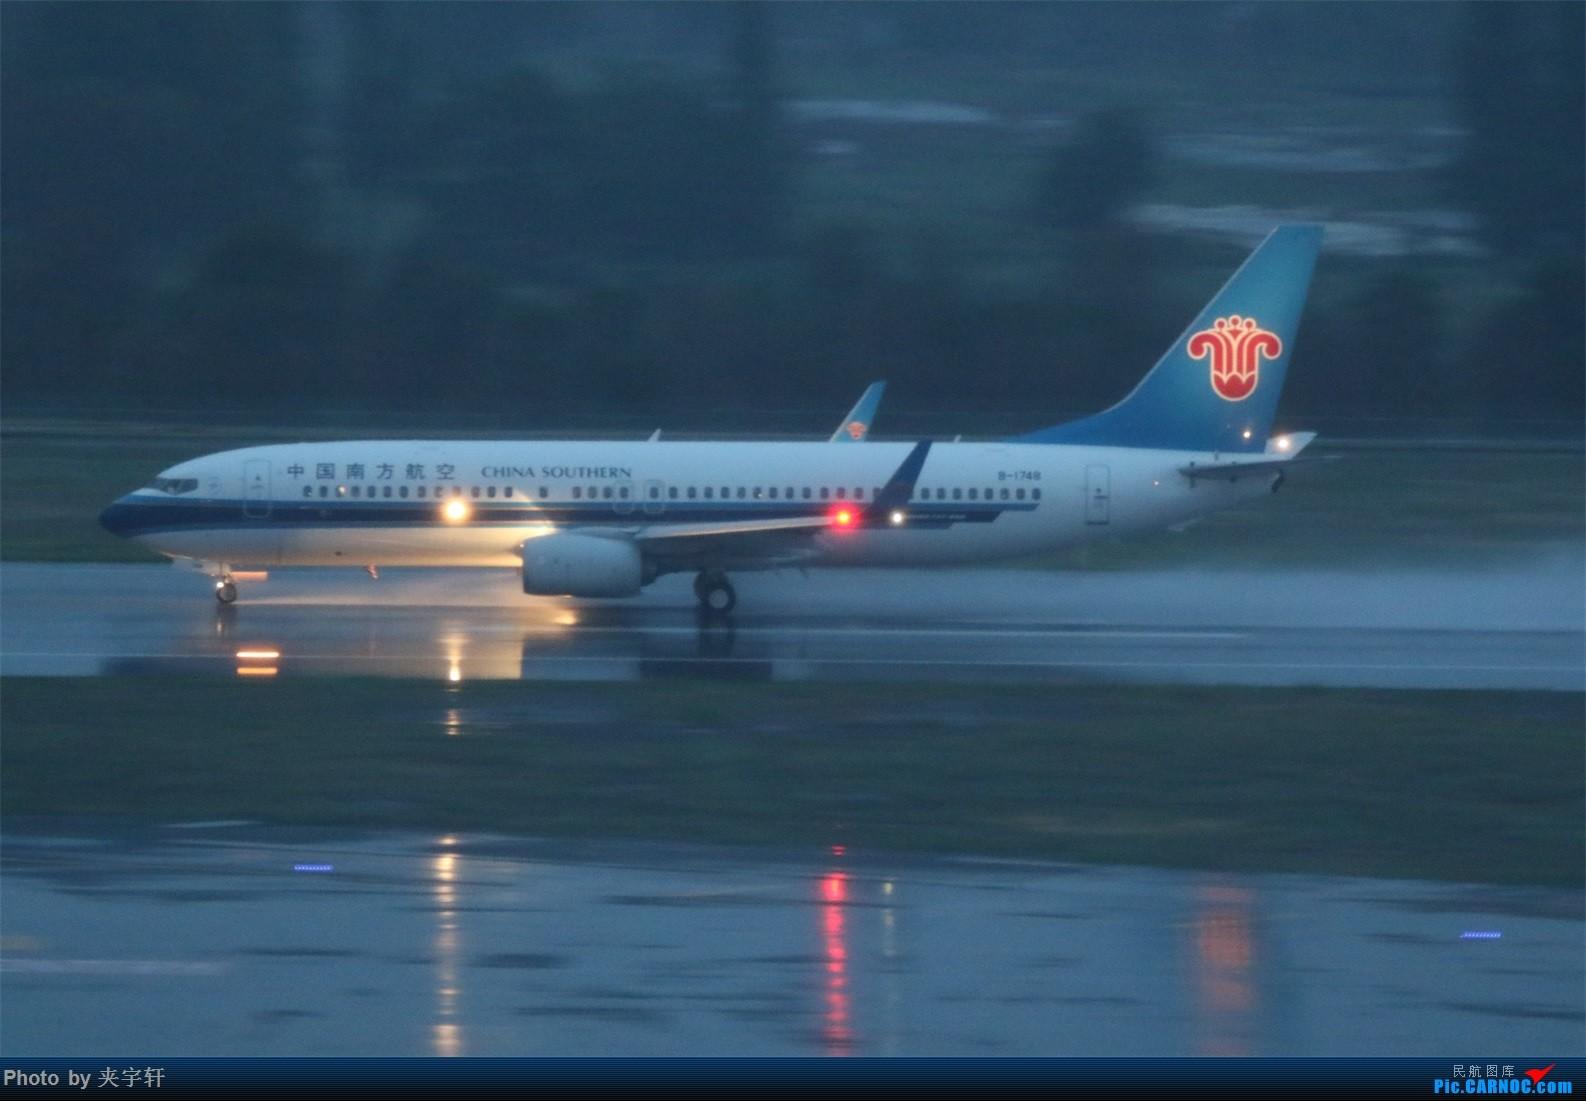 Re:[原创]【URC】雨天动图!+吹水 BOEING 737-800 B-1748 中国乌鲁木齐地窝堡国际机场